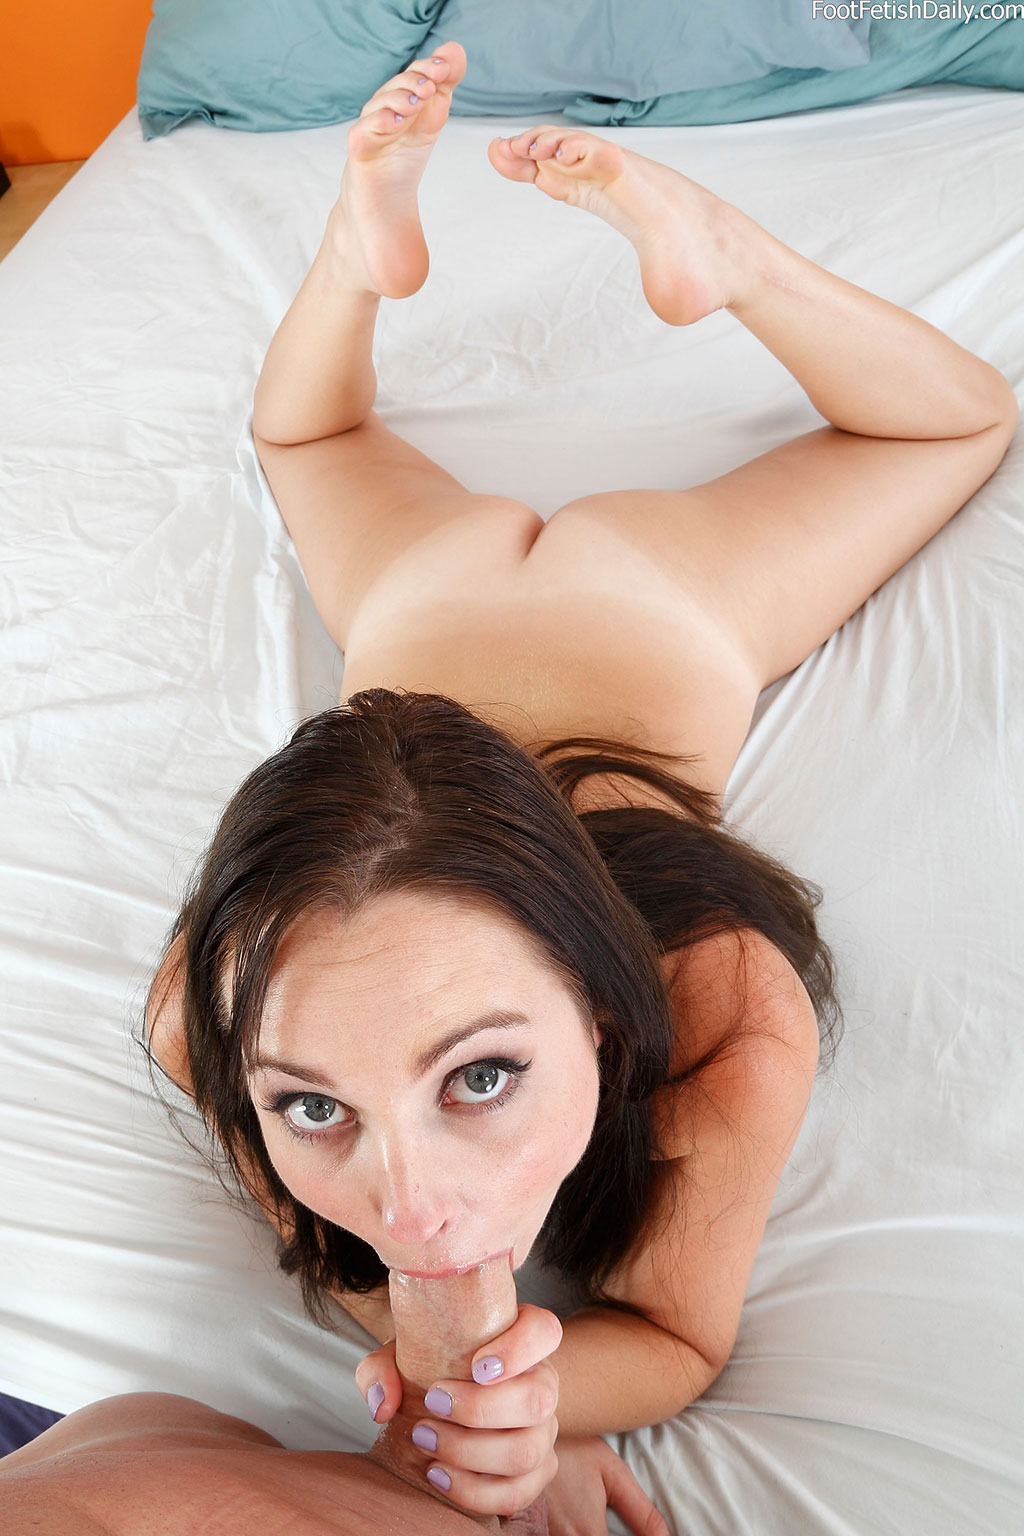 feet fetish porn site